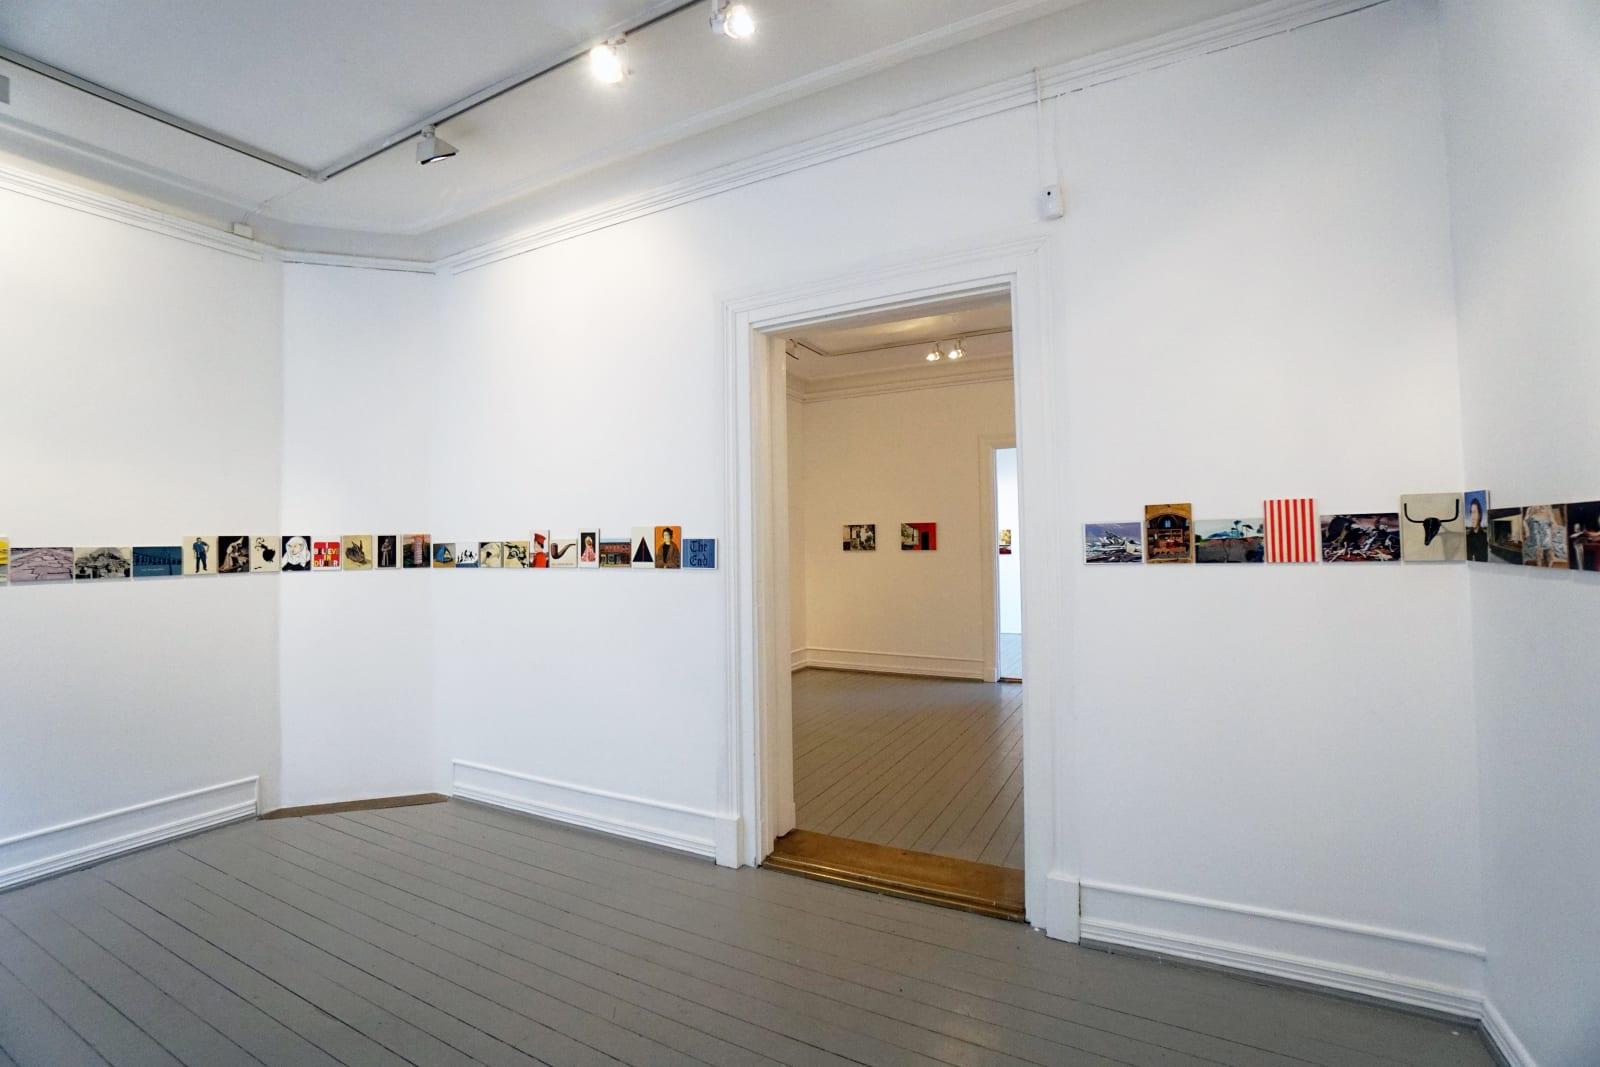 In An Ideal World/I en ideell verden, Galleri LMN, Oslo, 2017